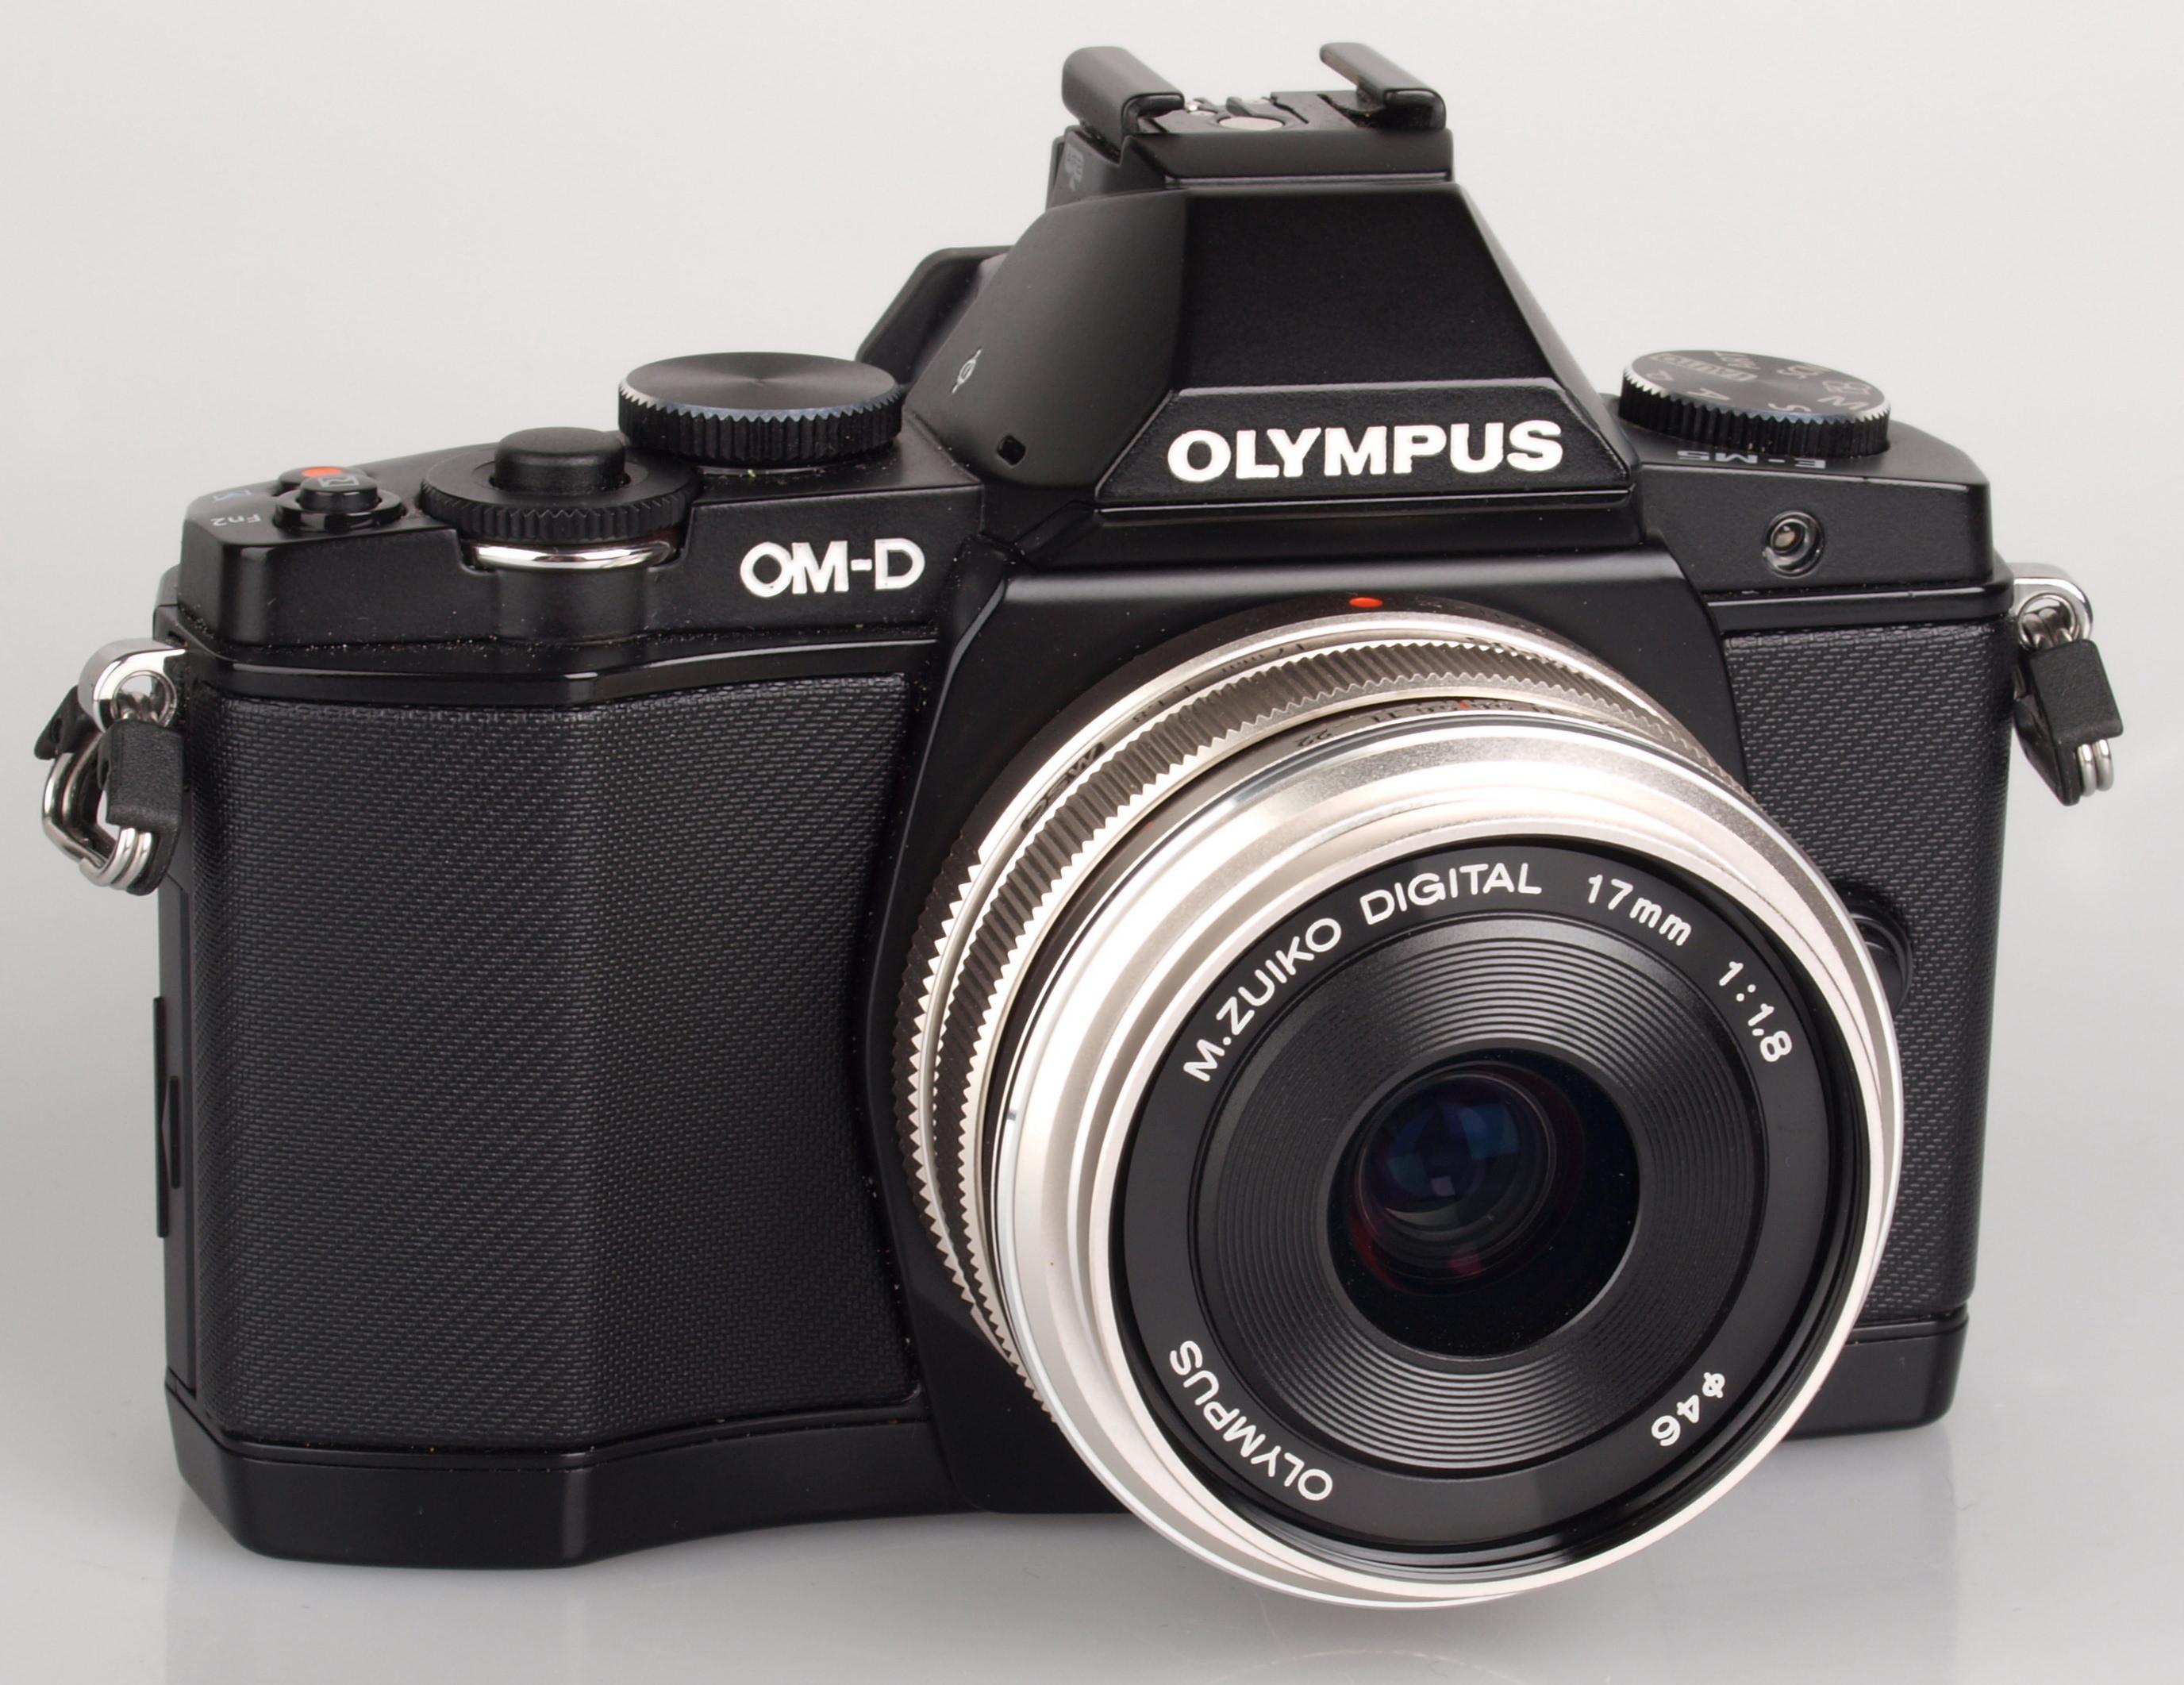 Olympus Digital Camera M.ZUIKO DIGITAL 17mm F1.8 Lens Drivers for Windows Download